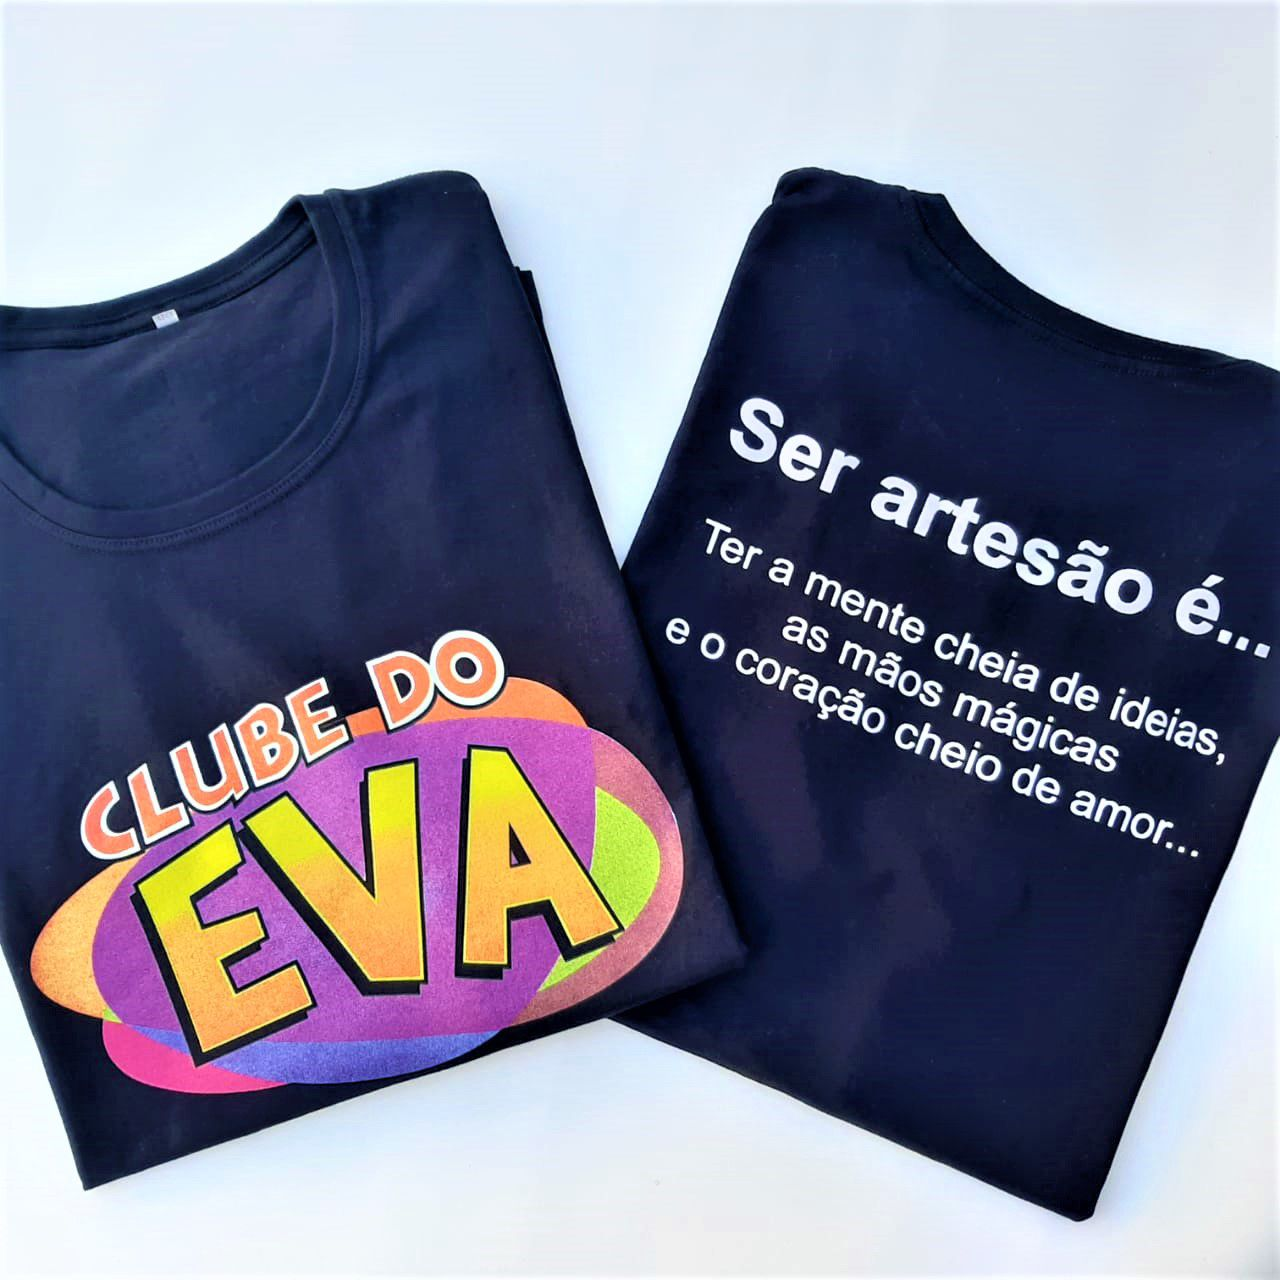 Camiseta Clube do EVA